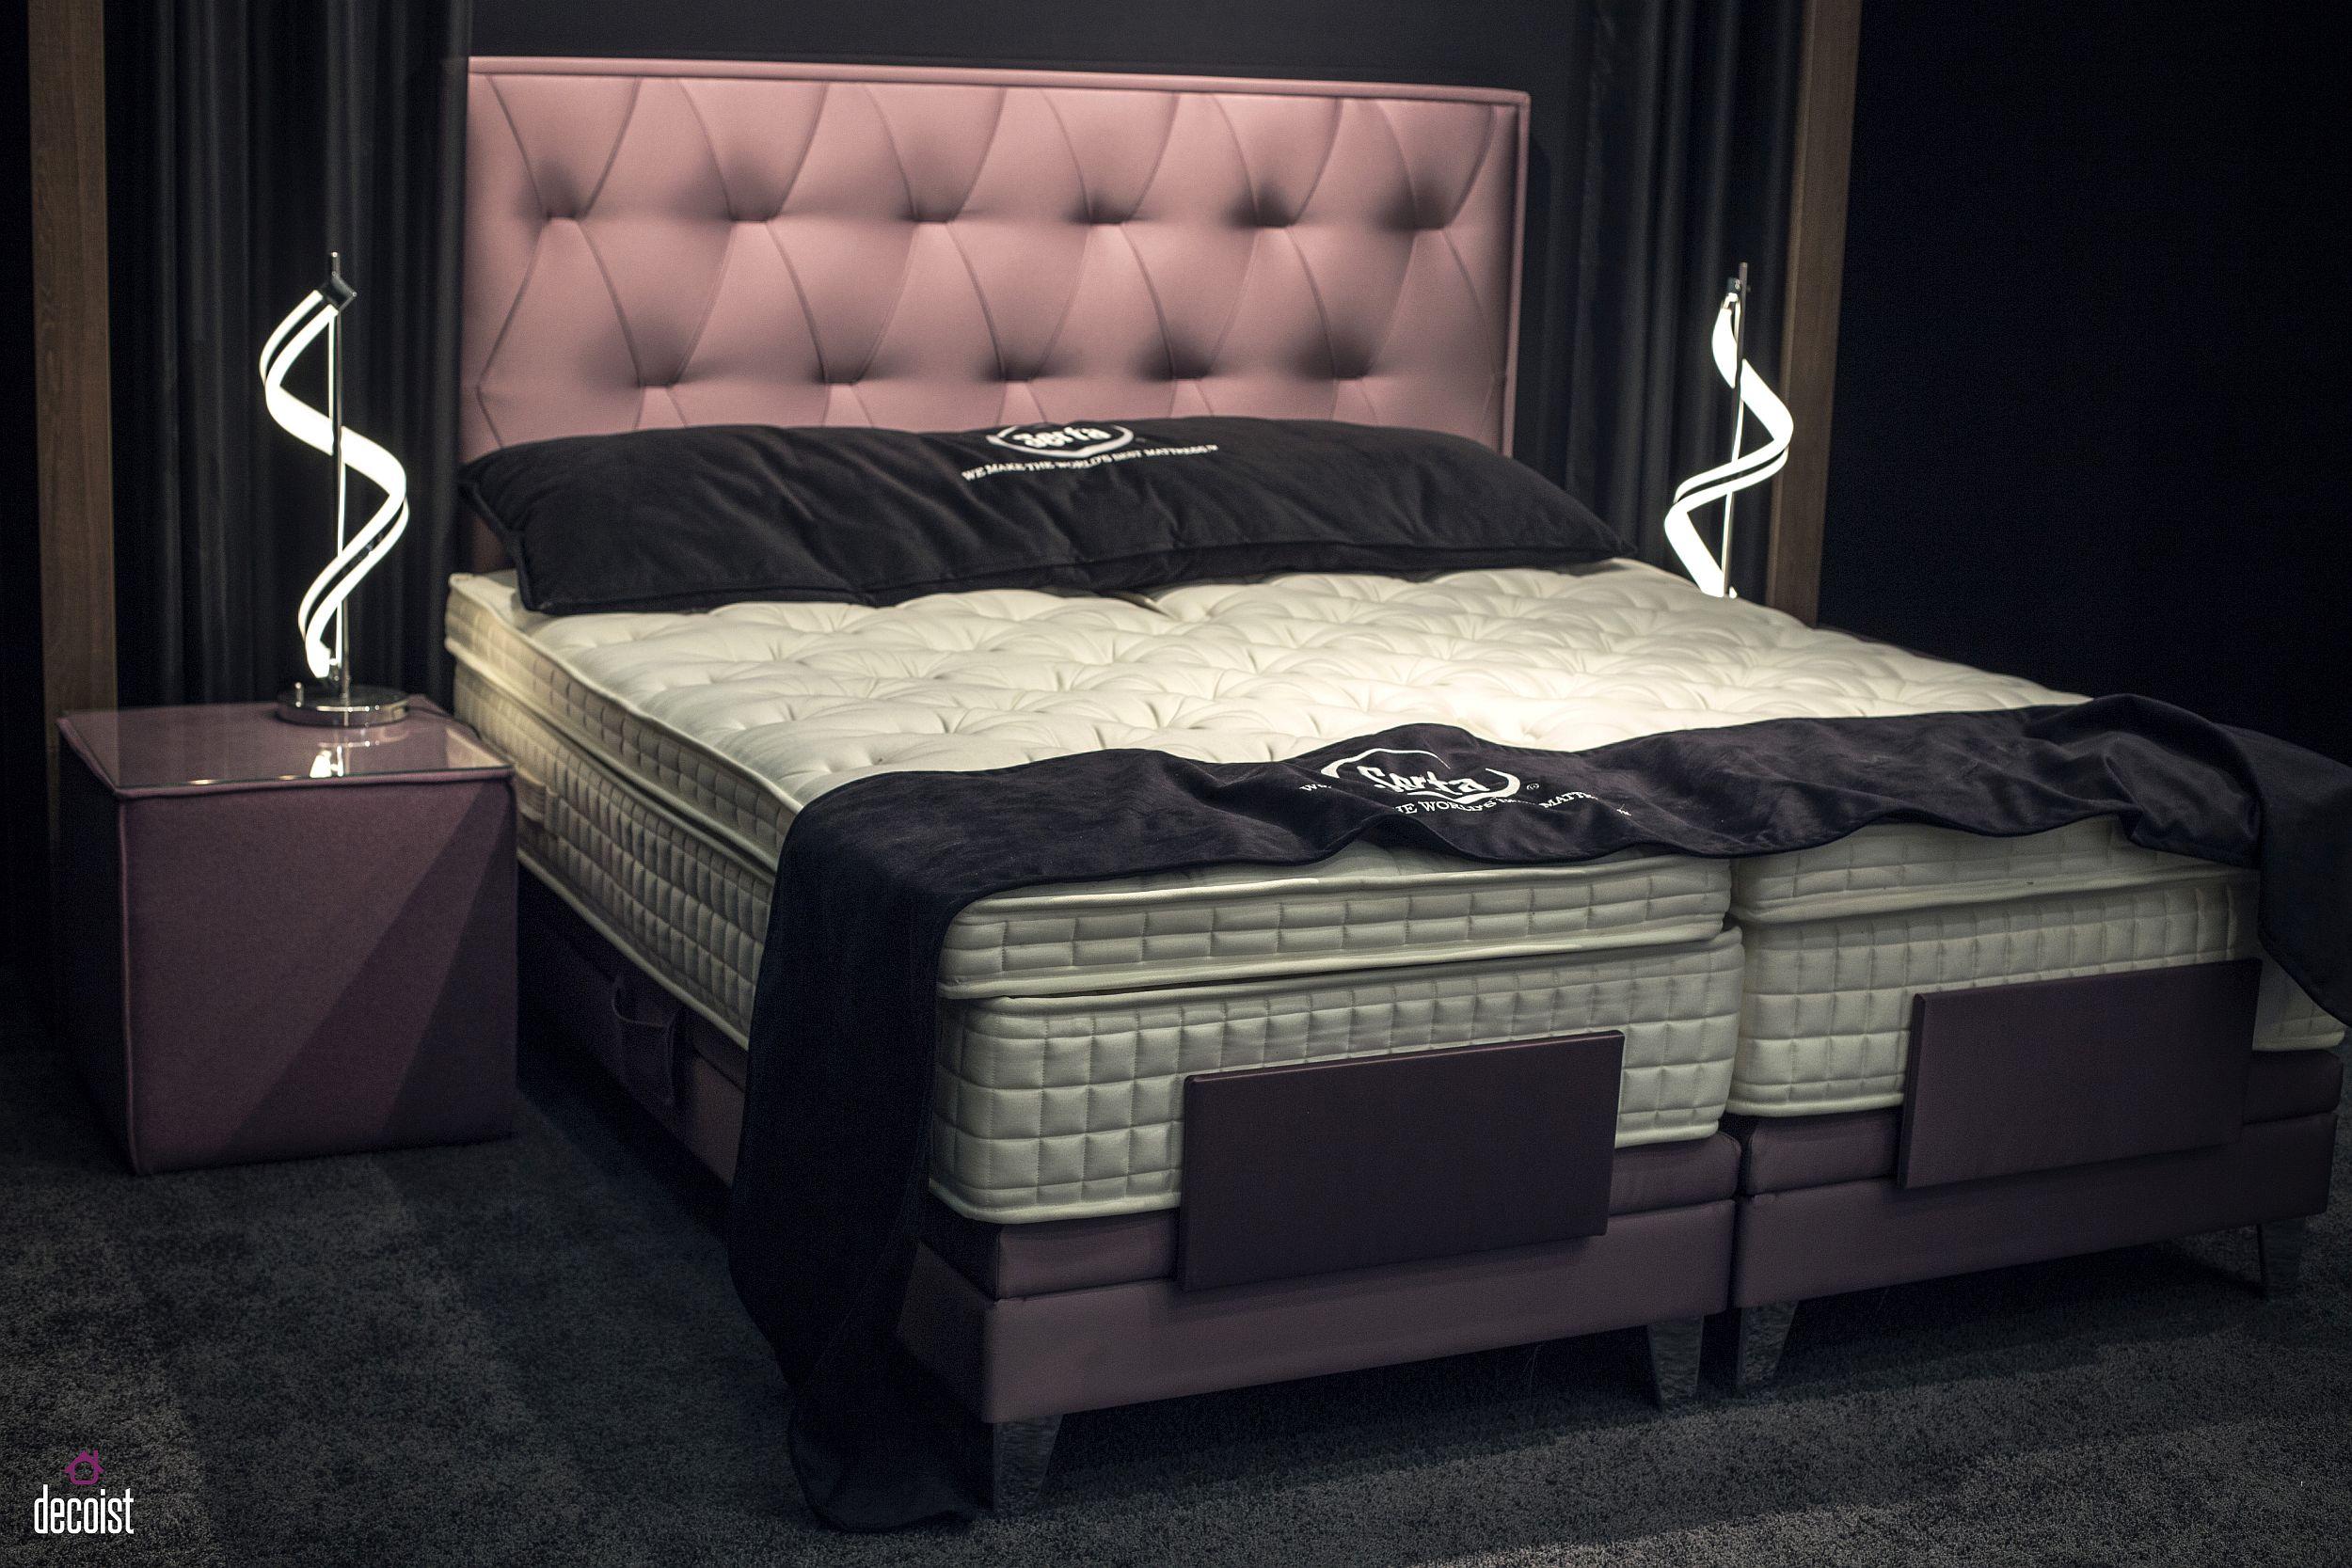 Purple-tufted-headboard-brings-an-air-of-luxury-to-the-bedroom